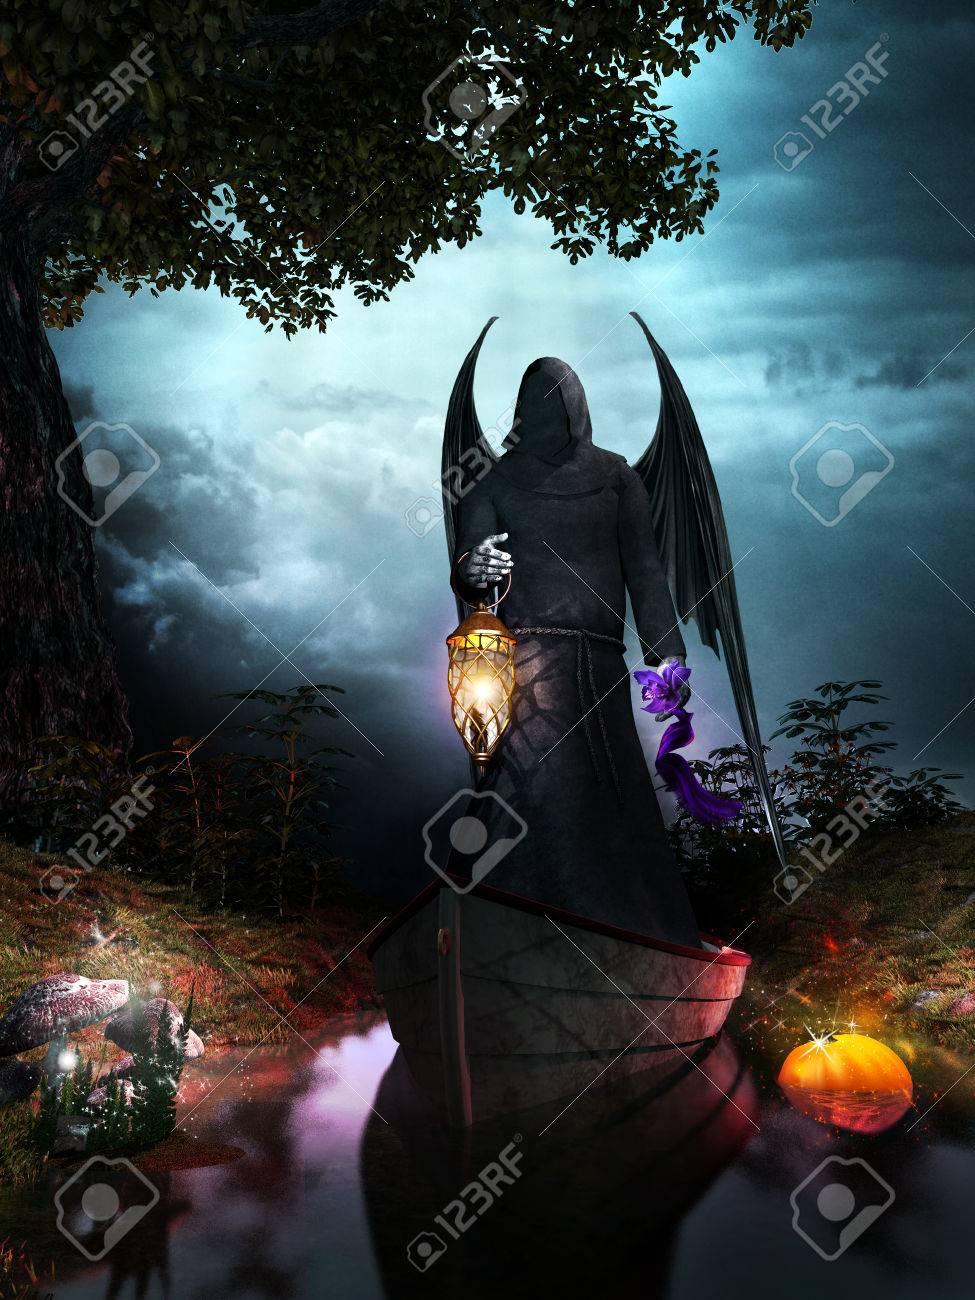 Night Scene With Angel Holding A Lantern Magic Mushrooms And Pumpkin Stock Photo